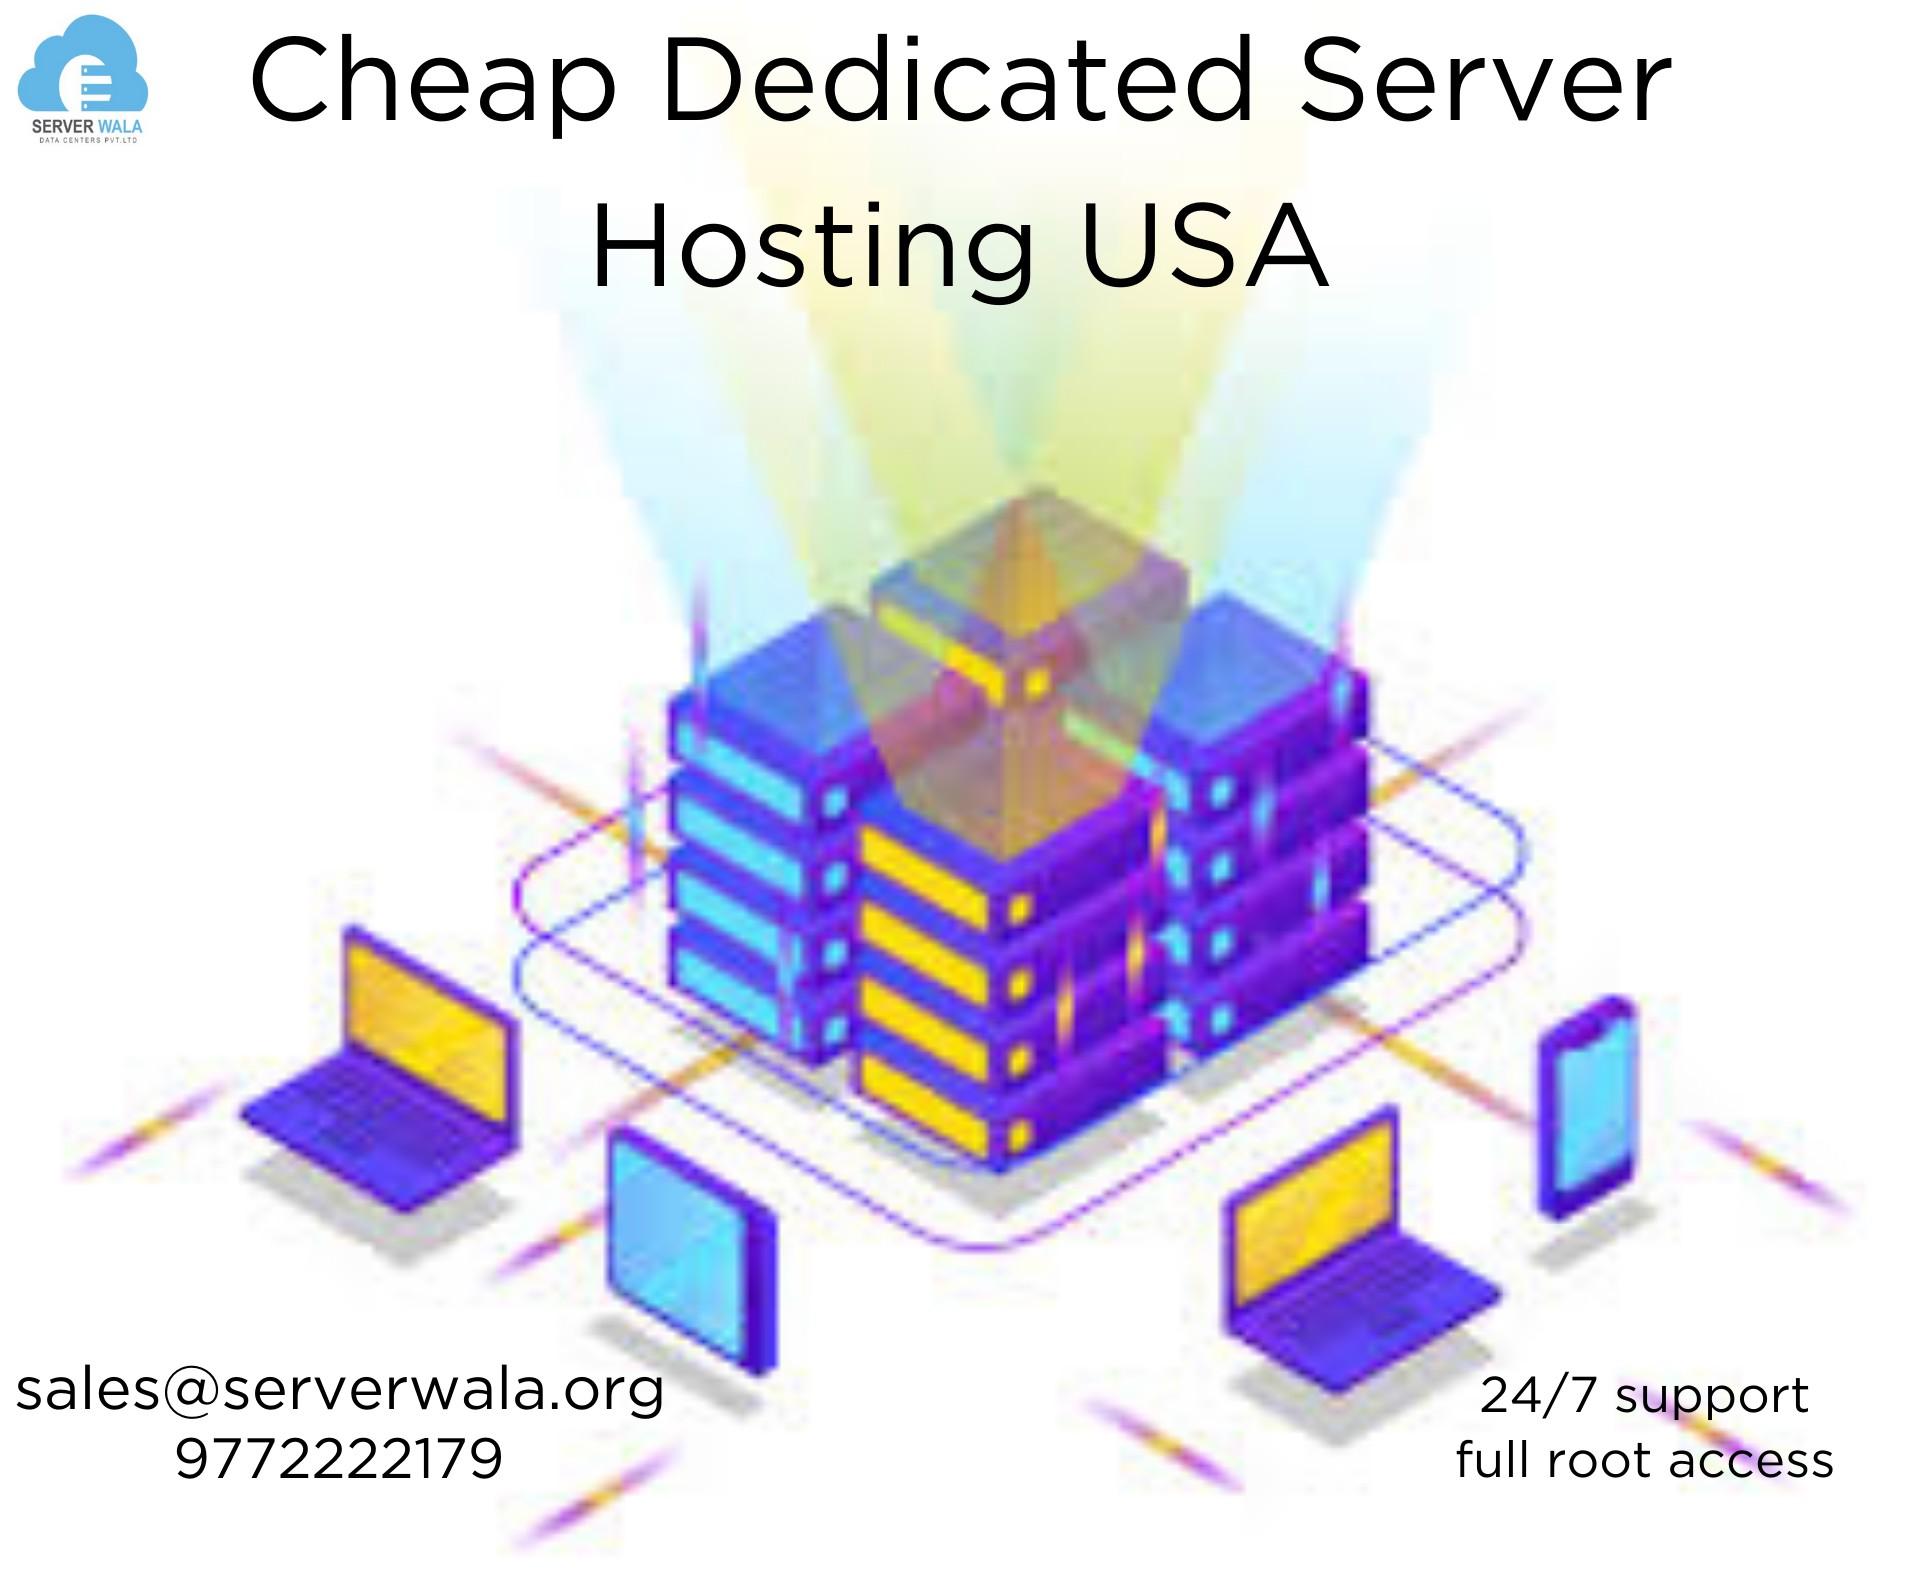 USA Dedicated Server   Dedicated Server USA